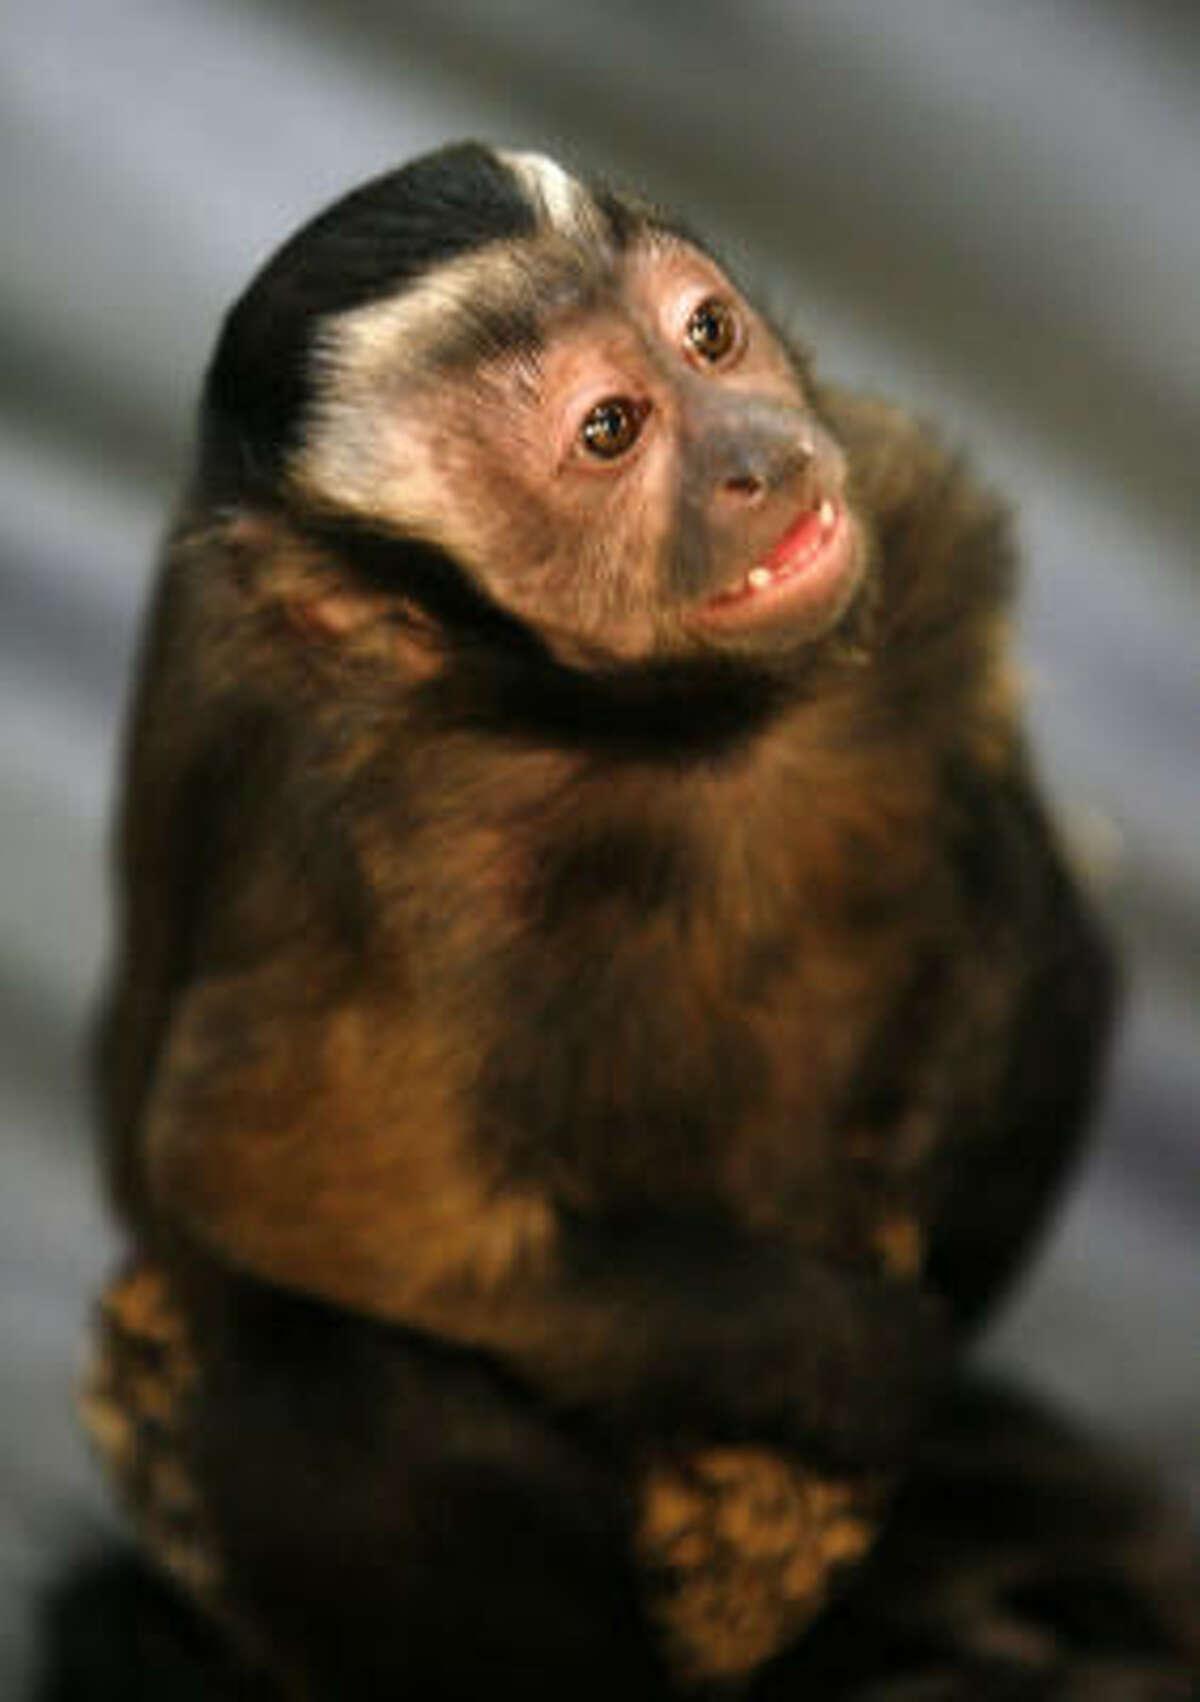 Sasha belongs to Gallery Furniture employee Robert Williams, who helped the McIngvales buy their monkeys from a Tennessee breeder.